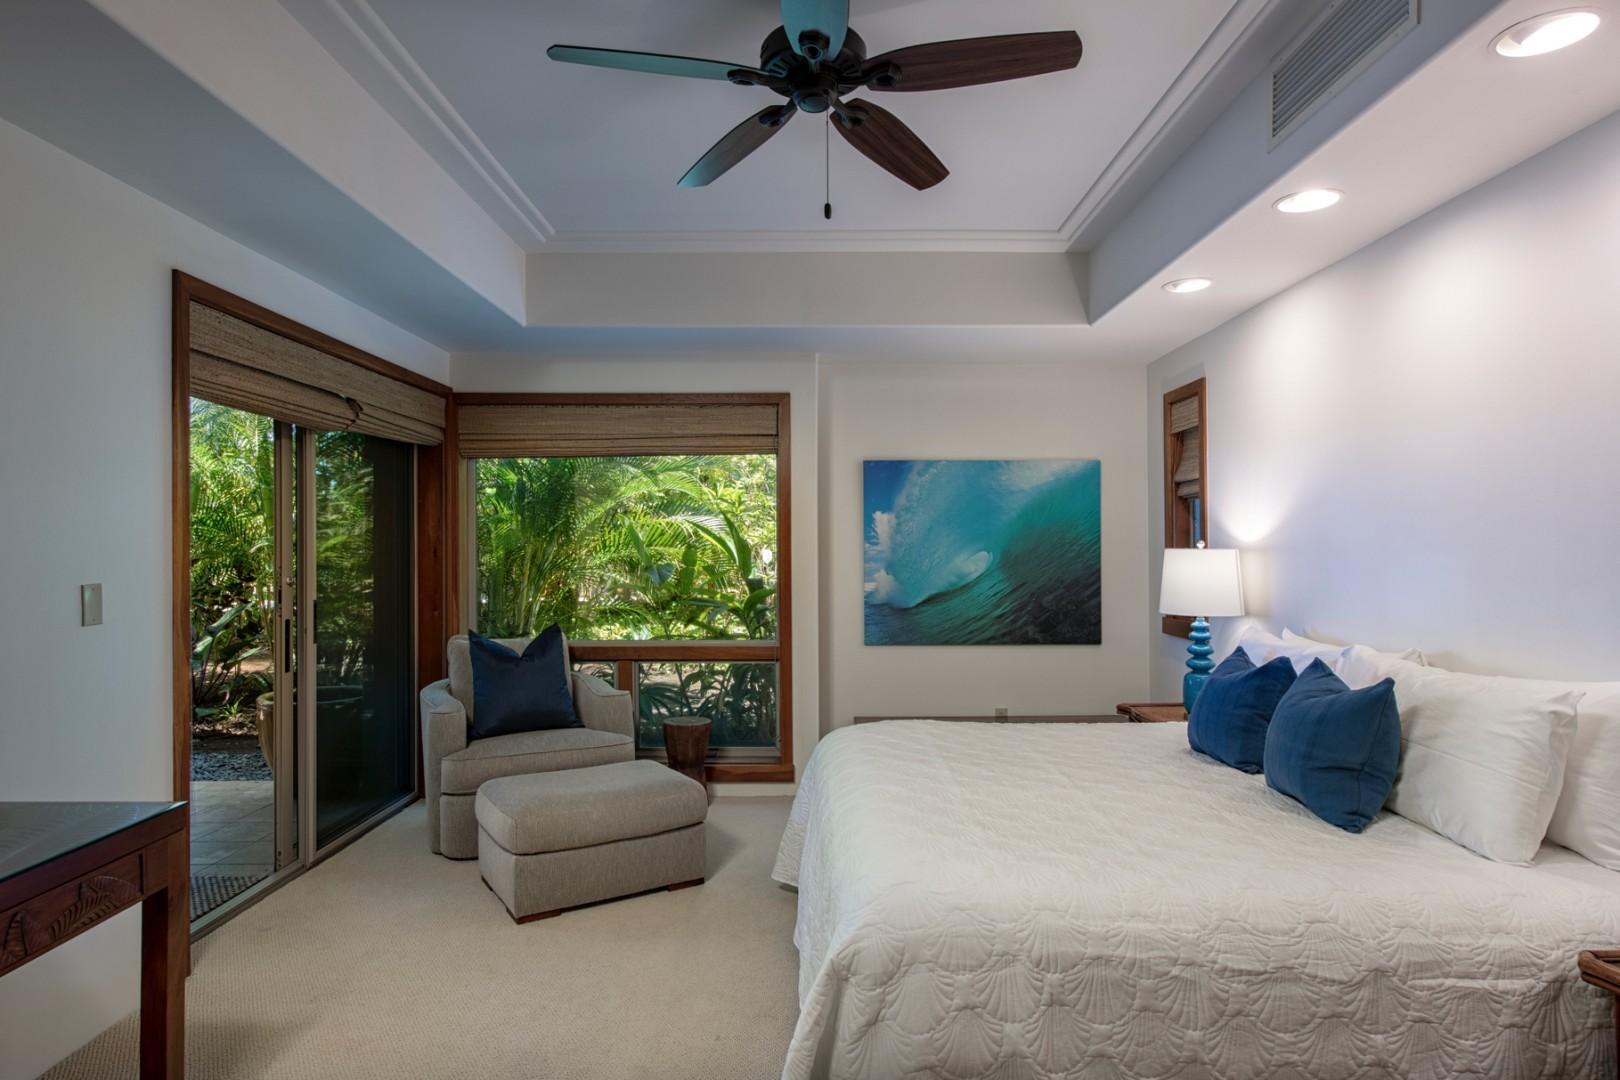 Alternate view of second bedroom.